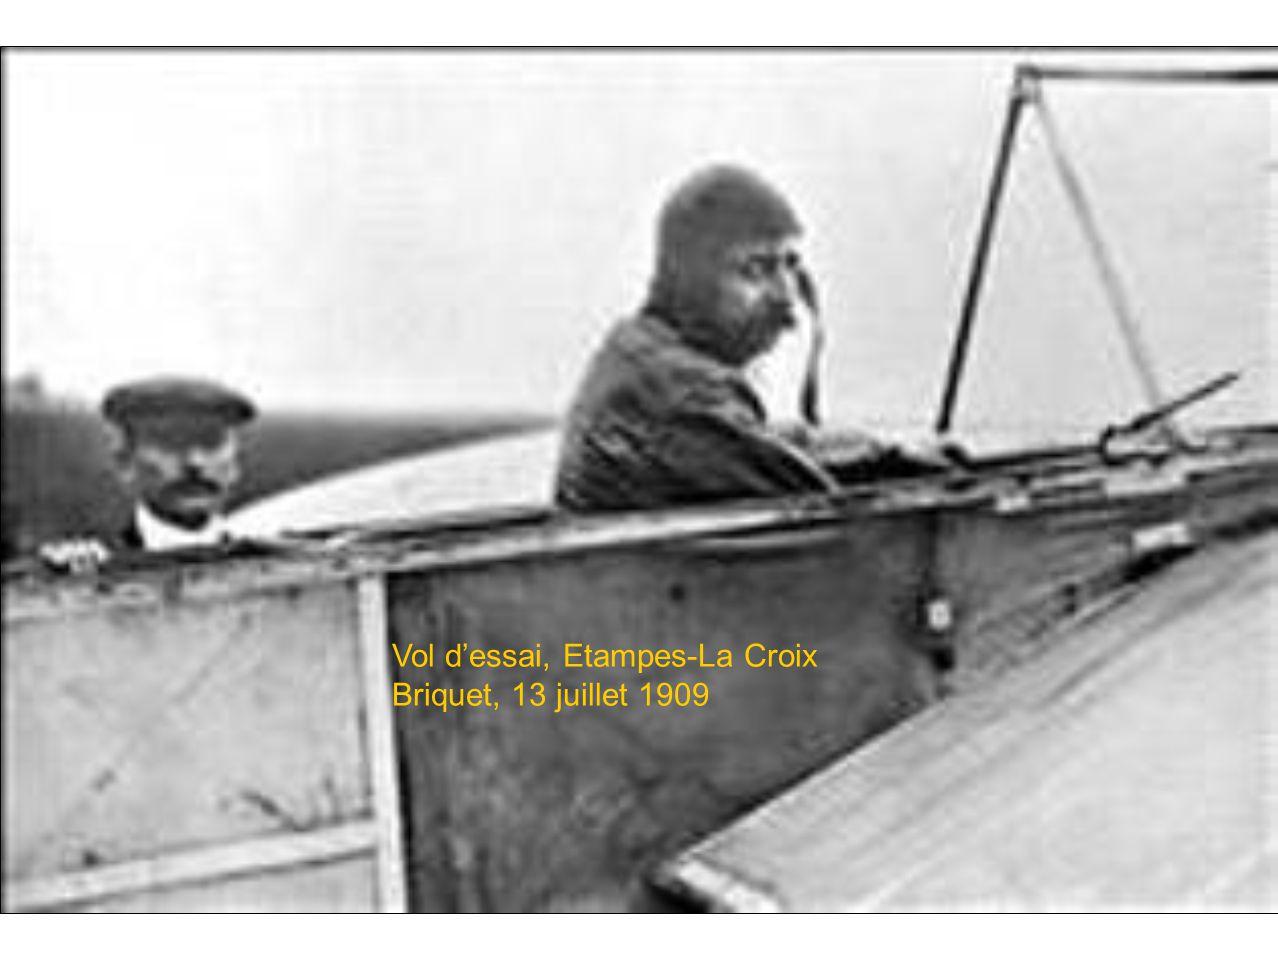 Vol dessai, Etampes-La Croix Briquet, 13 juillet 1909